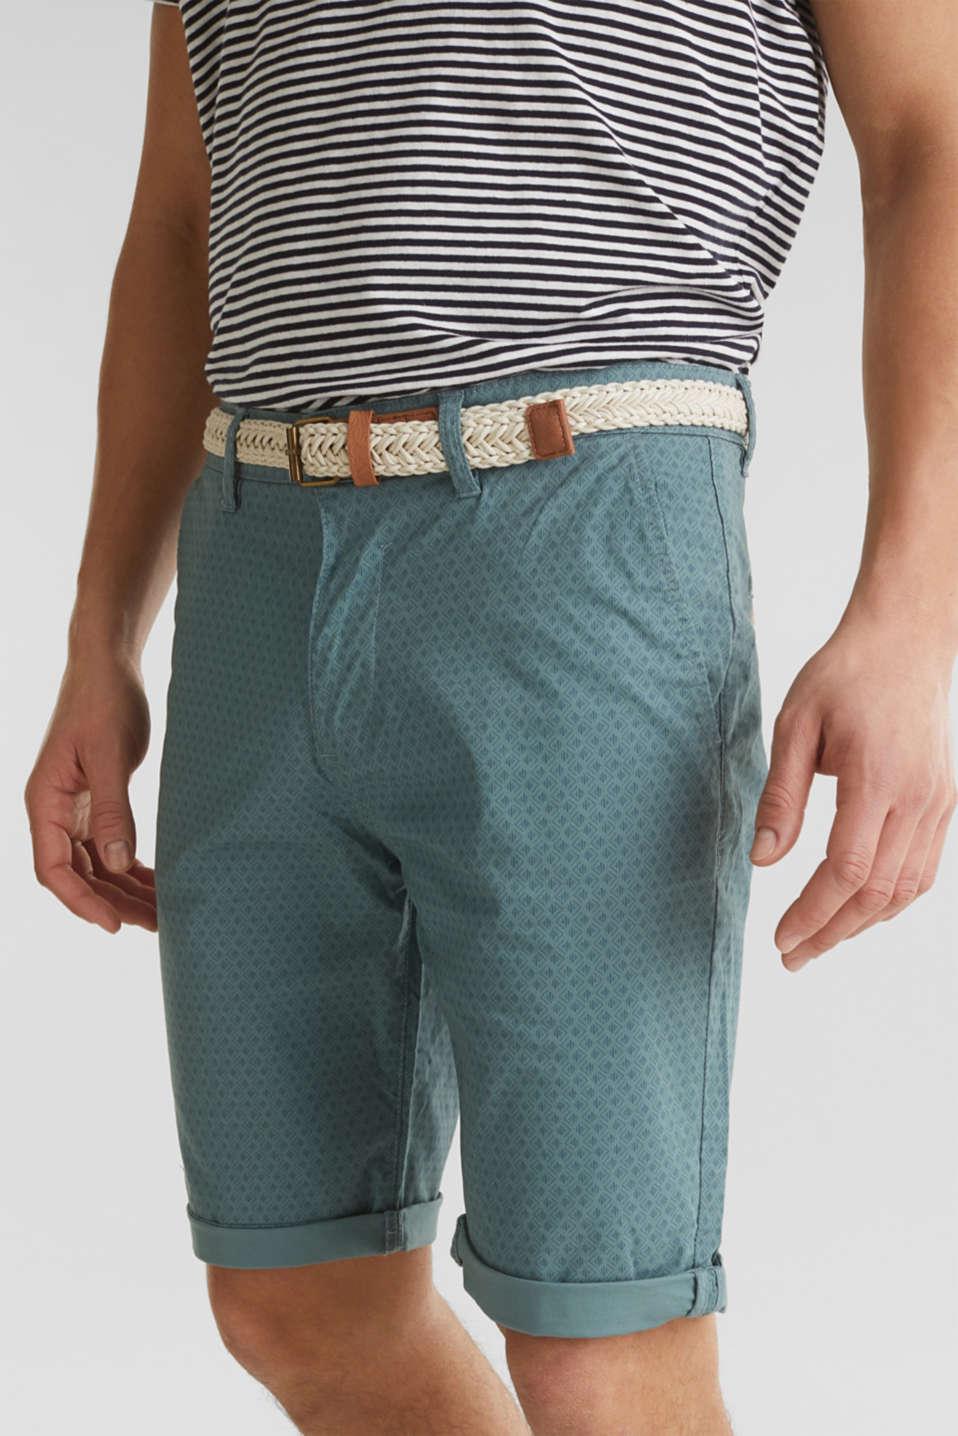 Organic cotton Shorts + belt, TEAL GREEN, detail image number 2